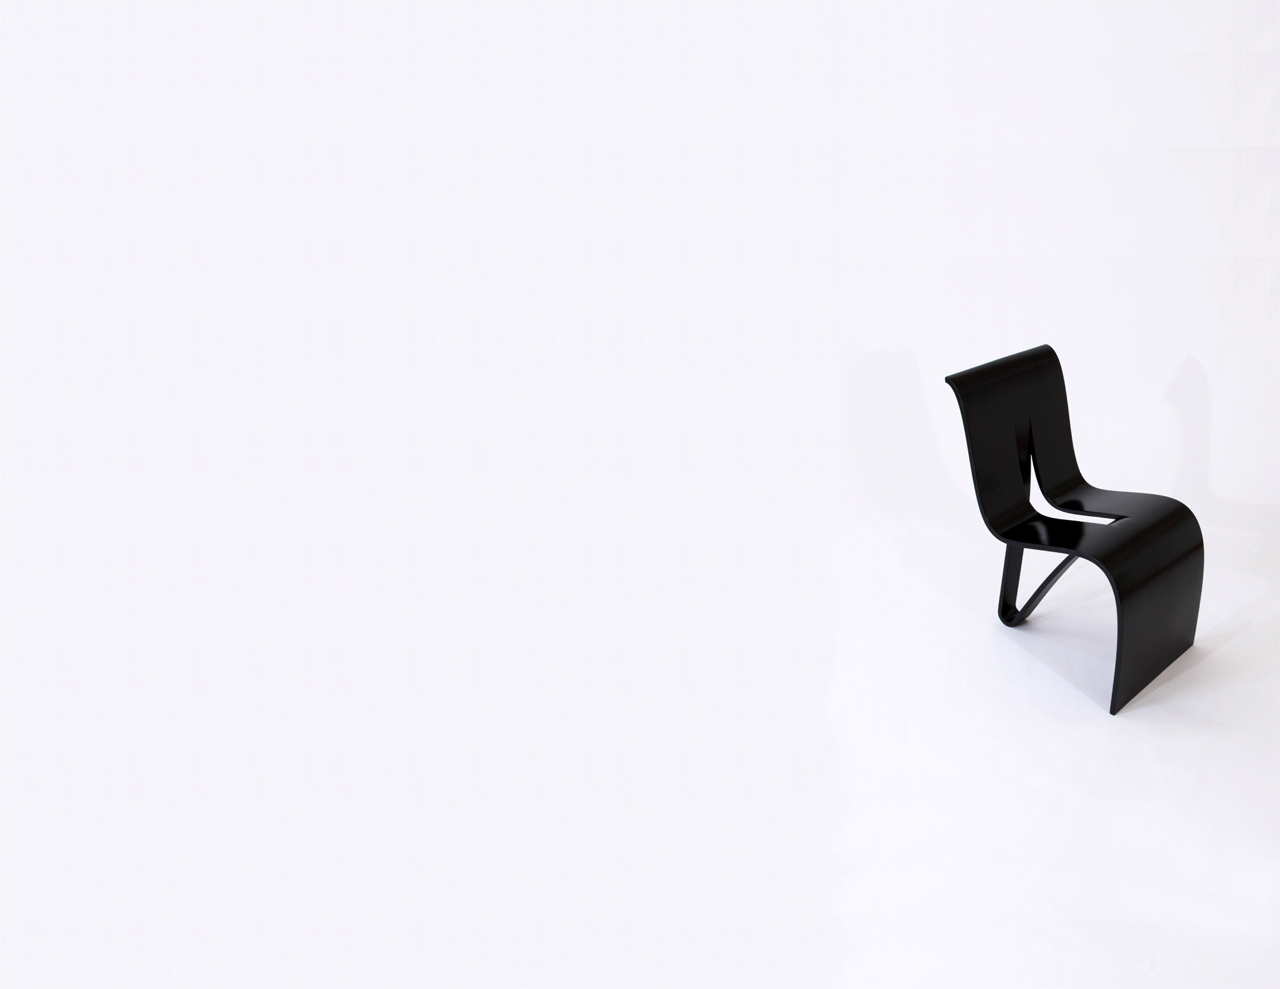 Cadeira Kulms / Miso Soup Design, © Miso Soup Desgin